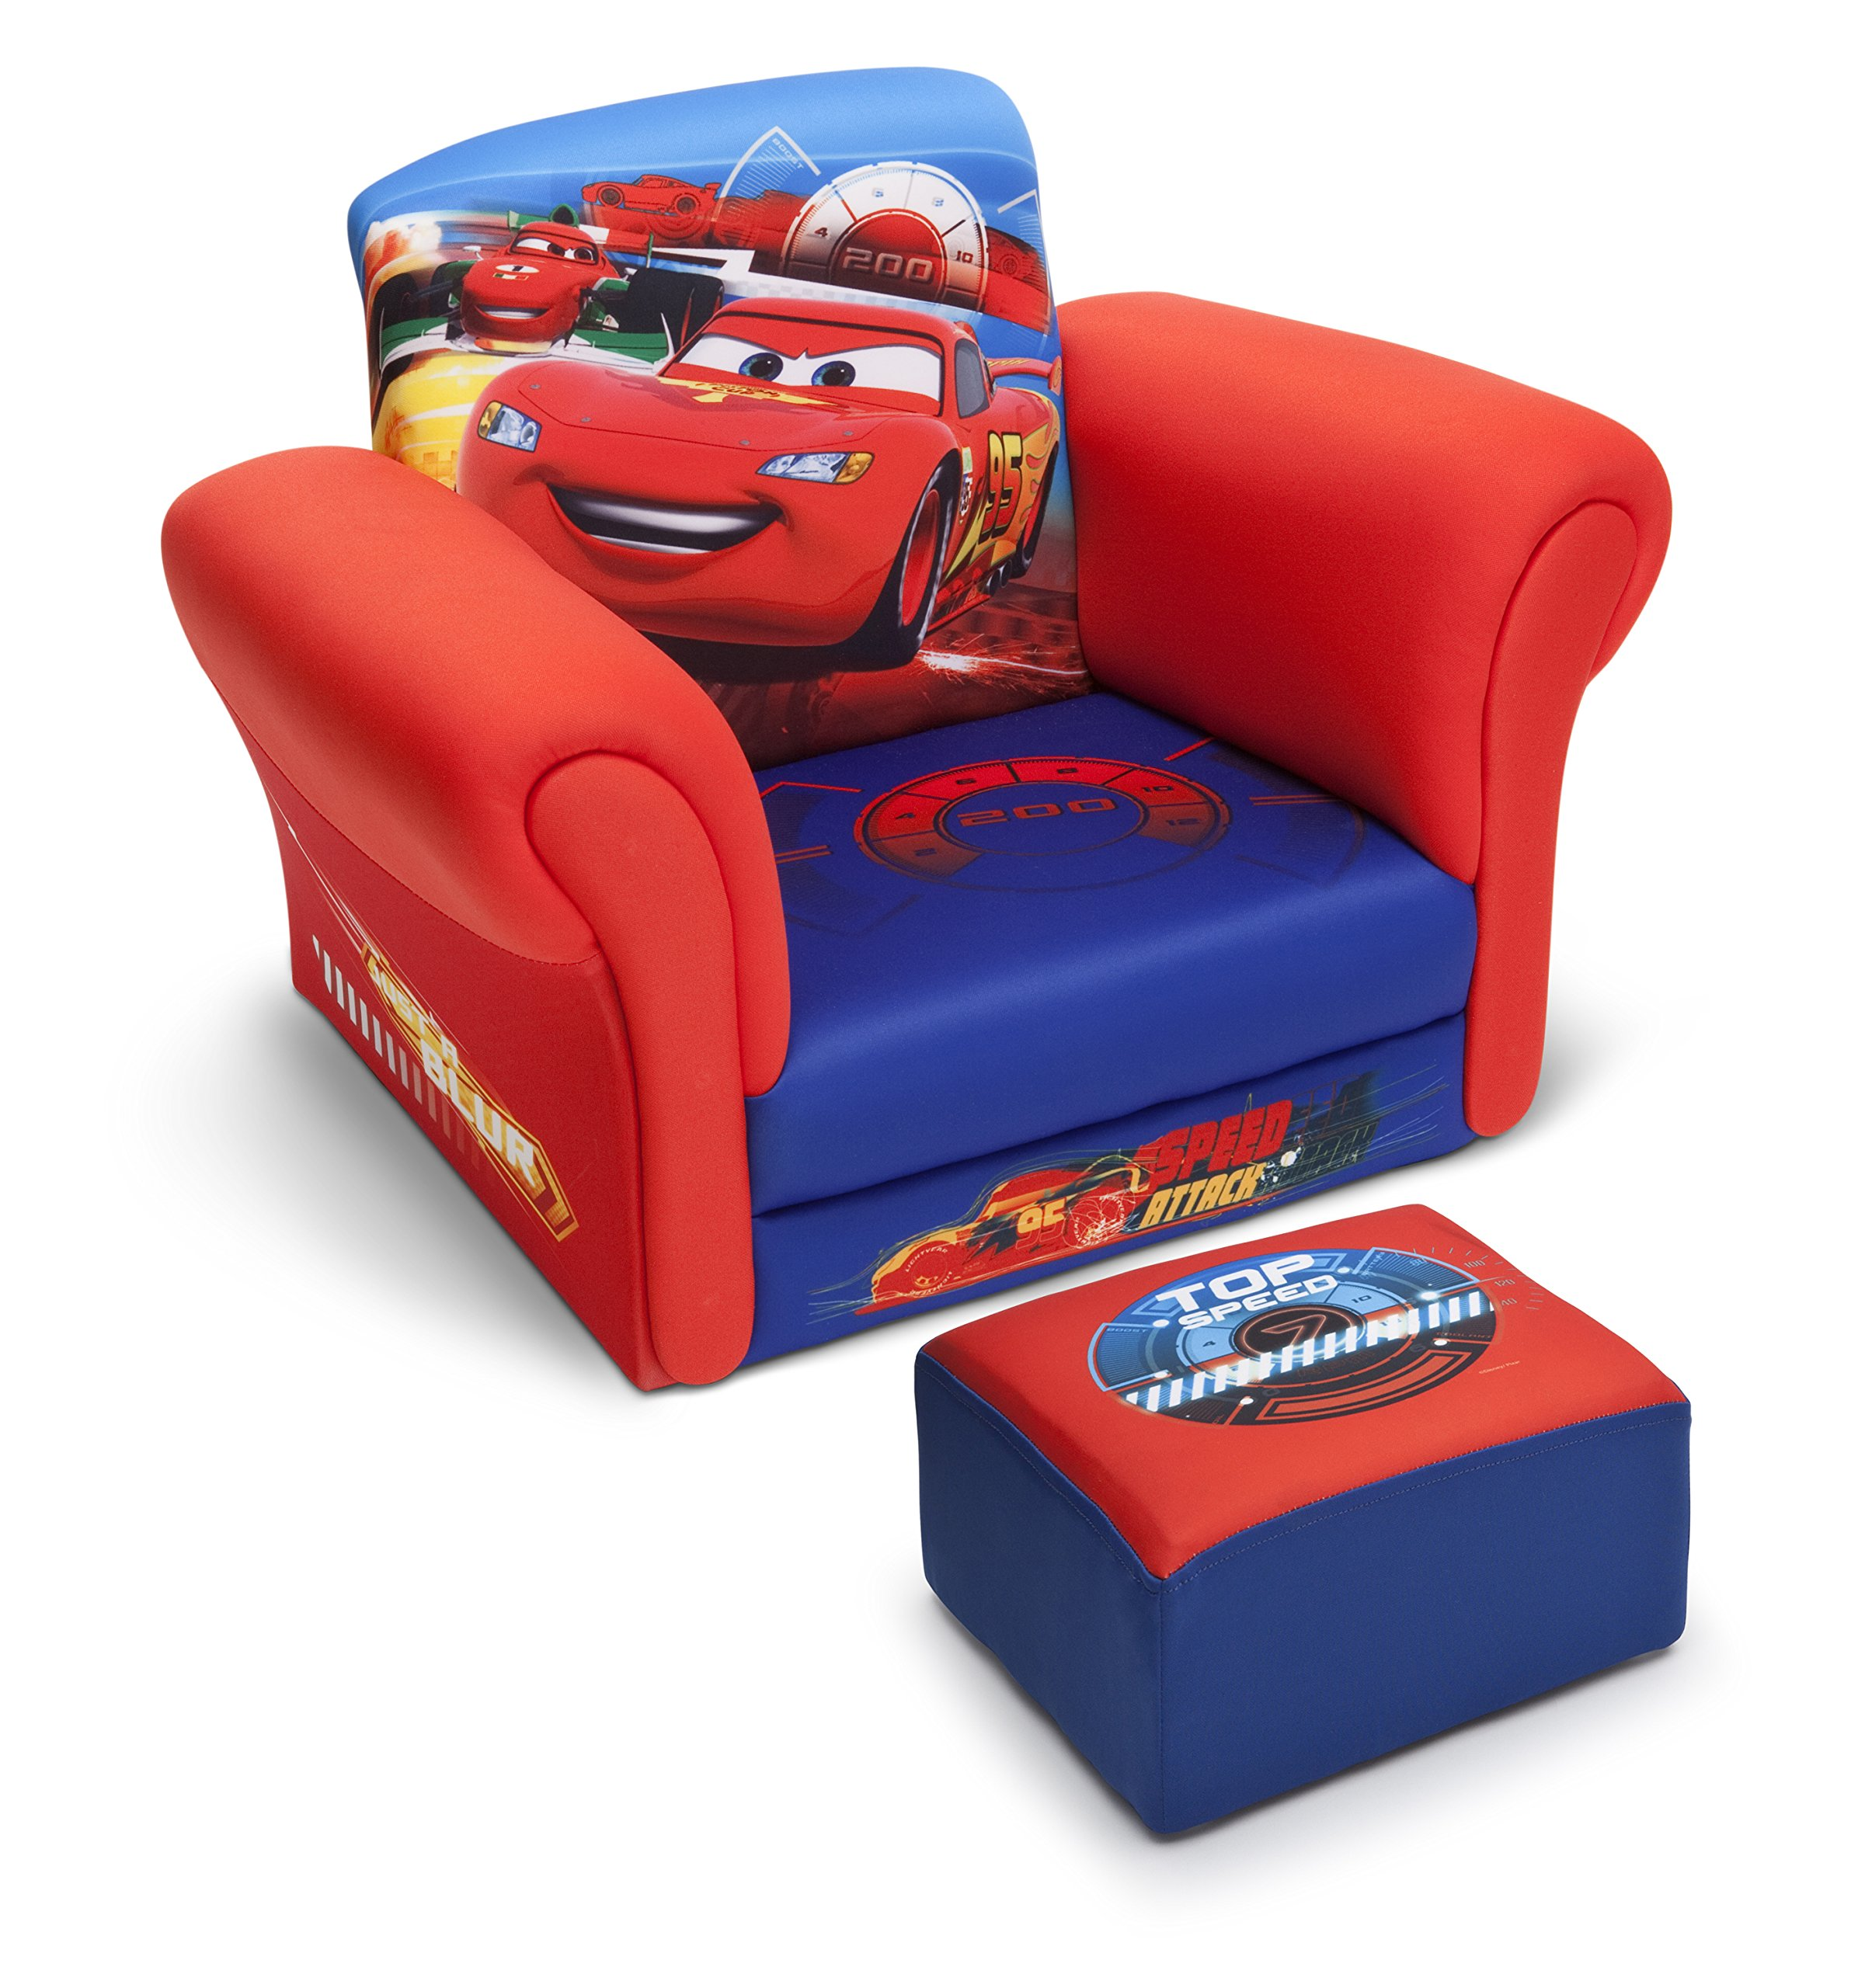 Delta Upholstered Chair Kids Children Furniture Toddler